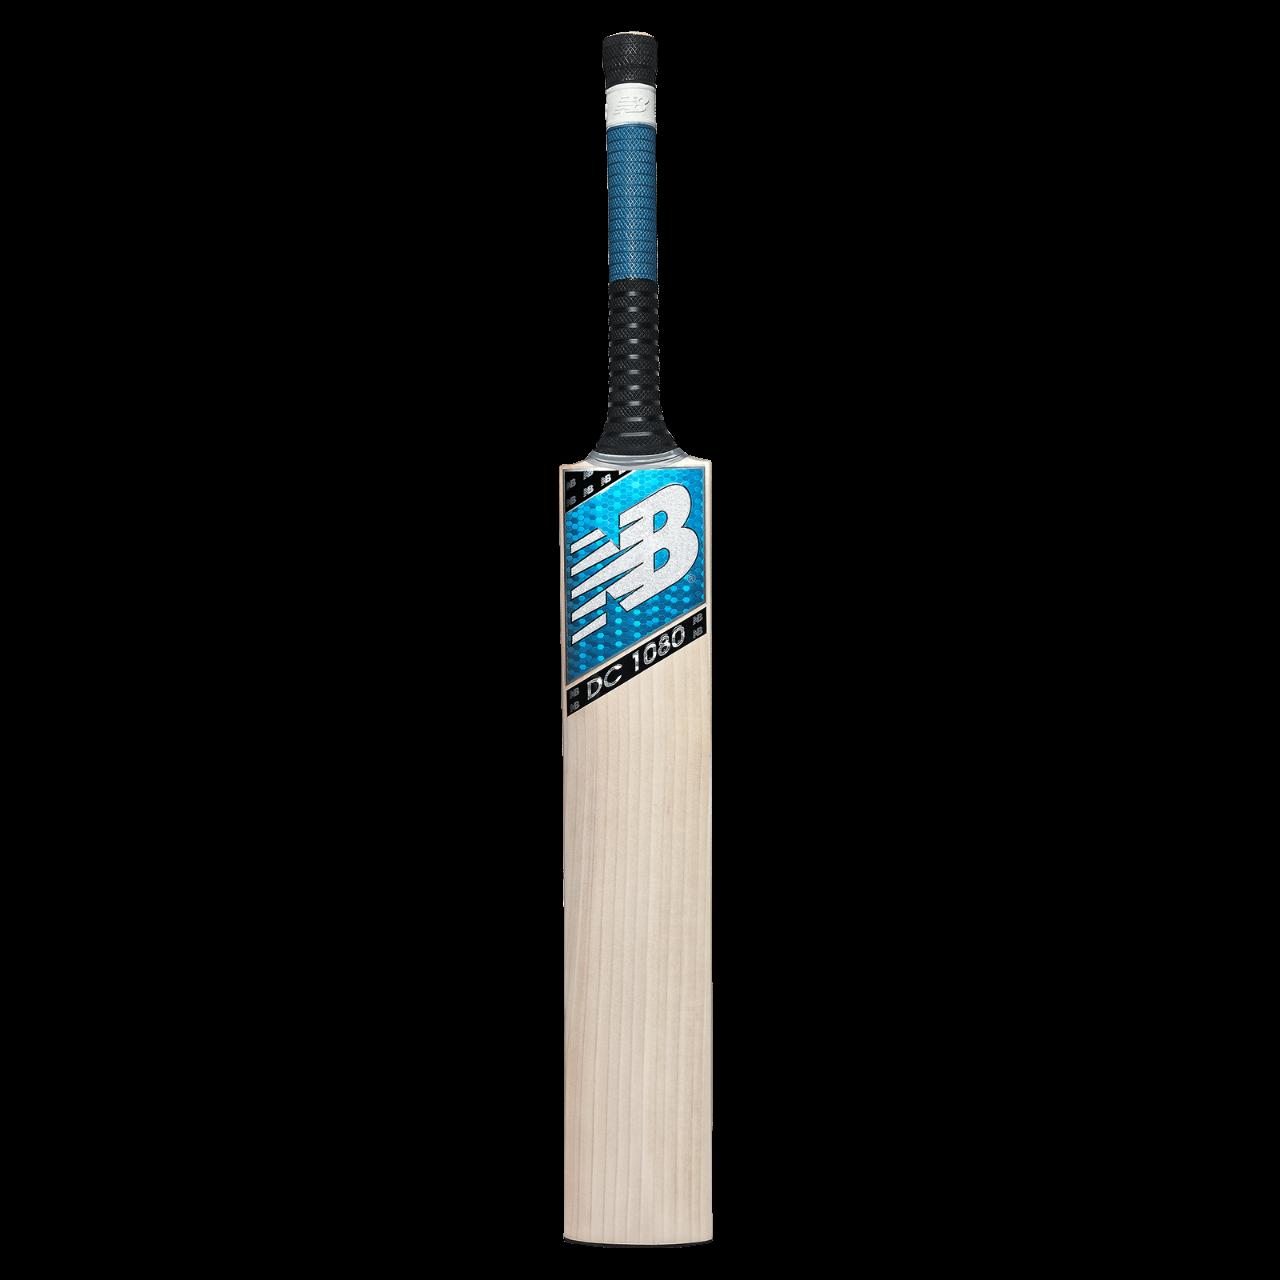 2020 New Balance DC 1080 Cricket Bat